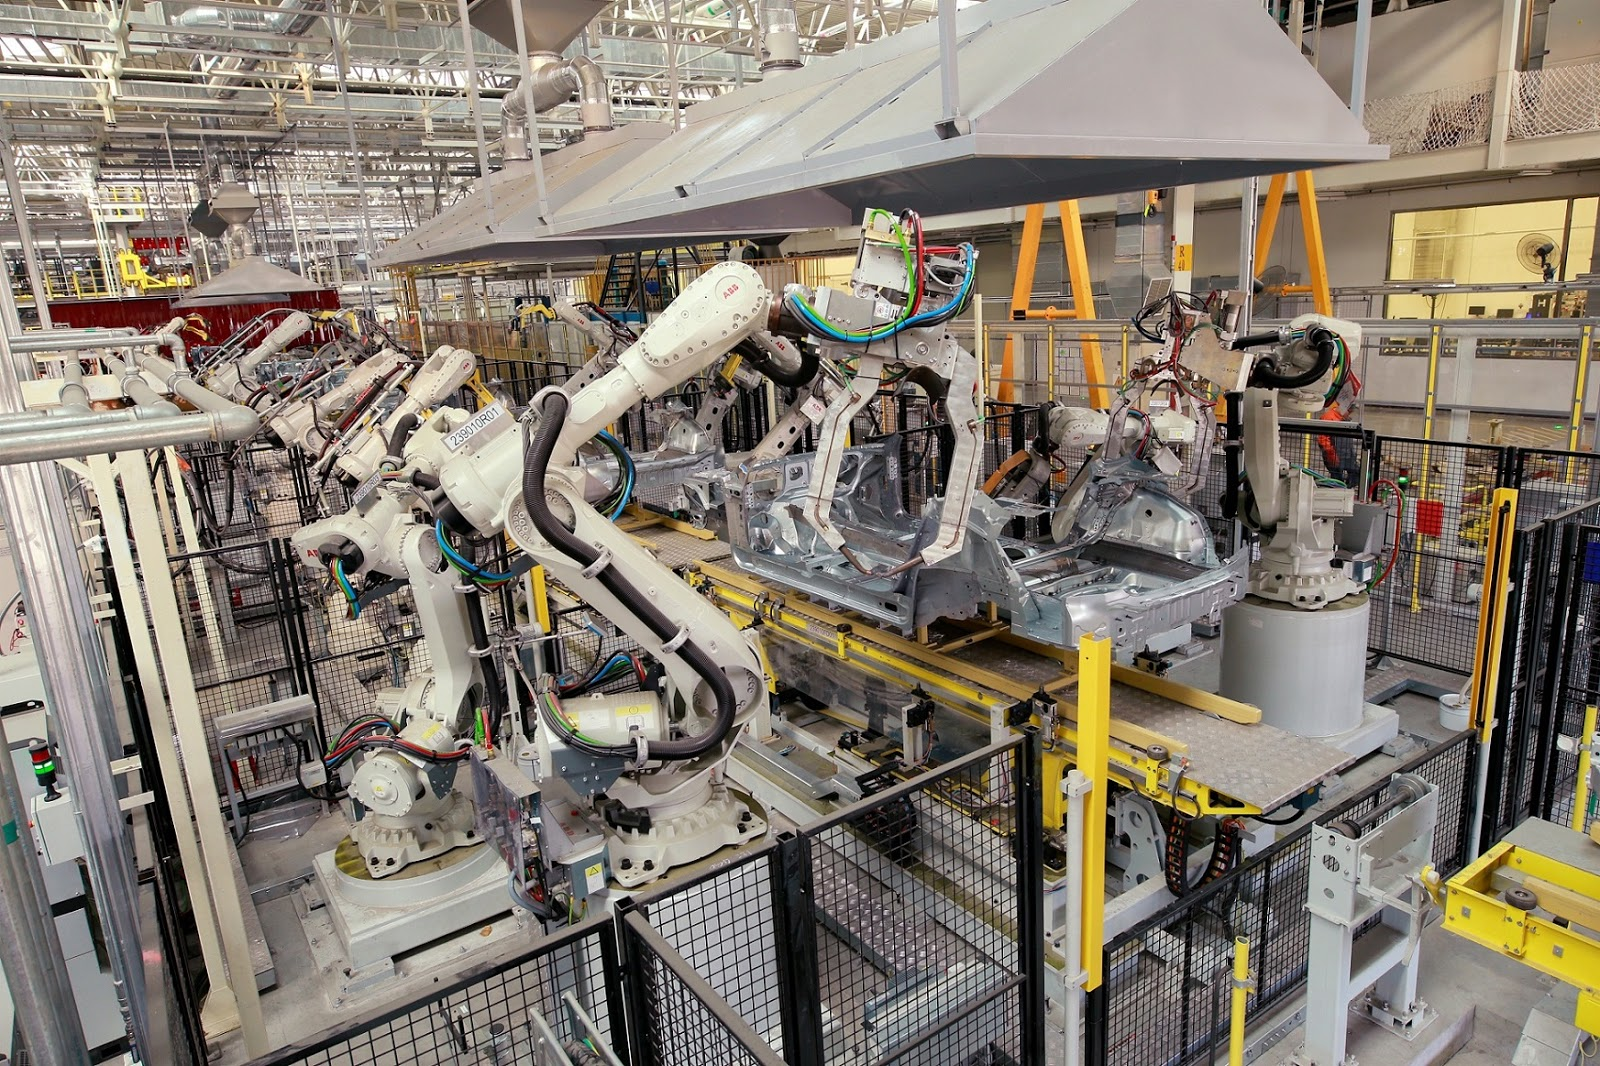 VOLVO NEW2BMANUFACTURING2BSTRATEGY2B1 H Volvo αυξάνει την παραγωγή της και αλλάζει στρατηγική για τα εργοστάσιά της σε Ευρώπη, Κίνα, ΗΠΑ Volvo, Volvo Cars, Volvo S90, Volvo S90 Excellence, αγορά, Τεχνολογία